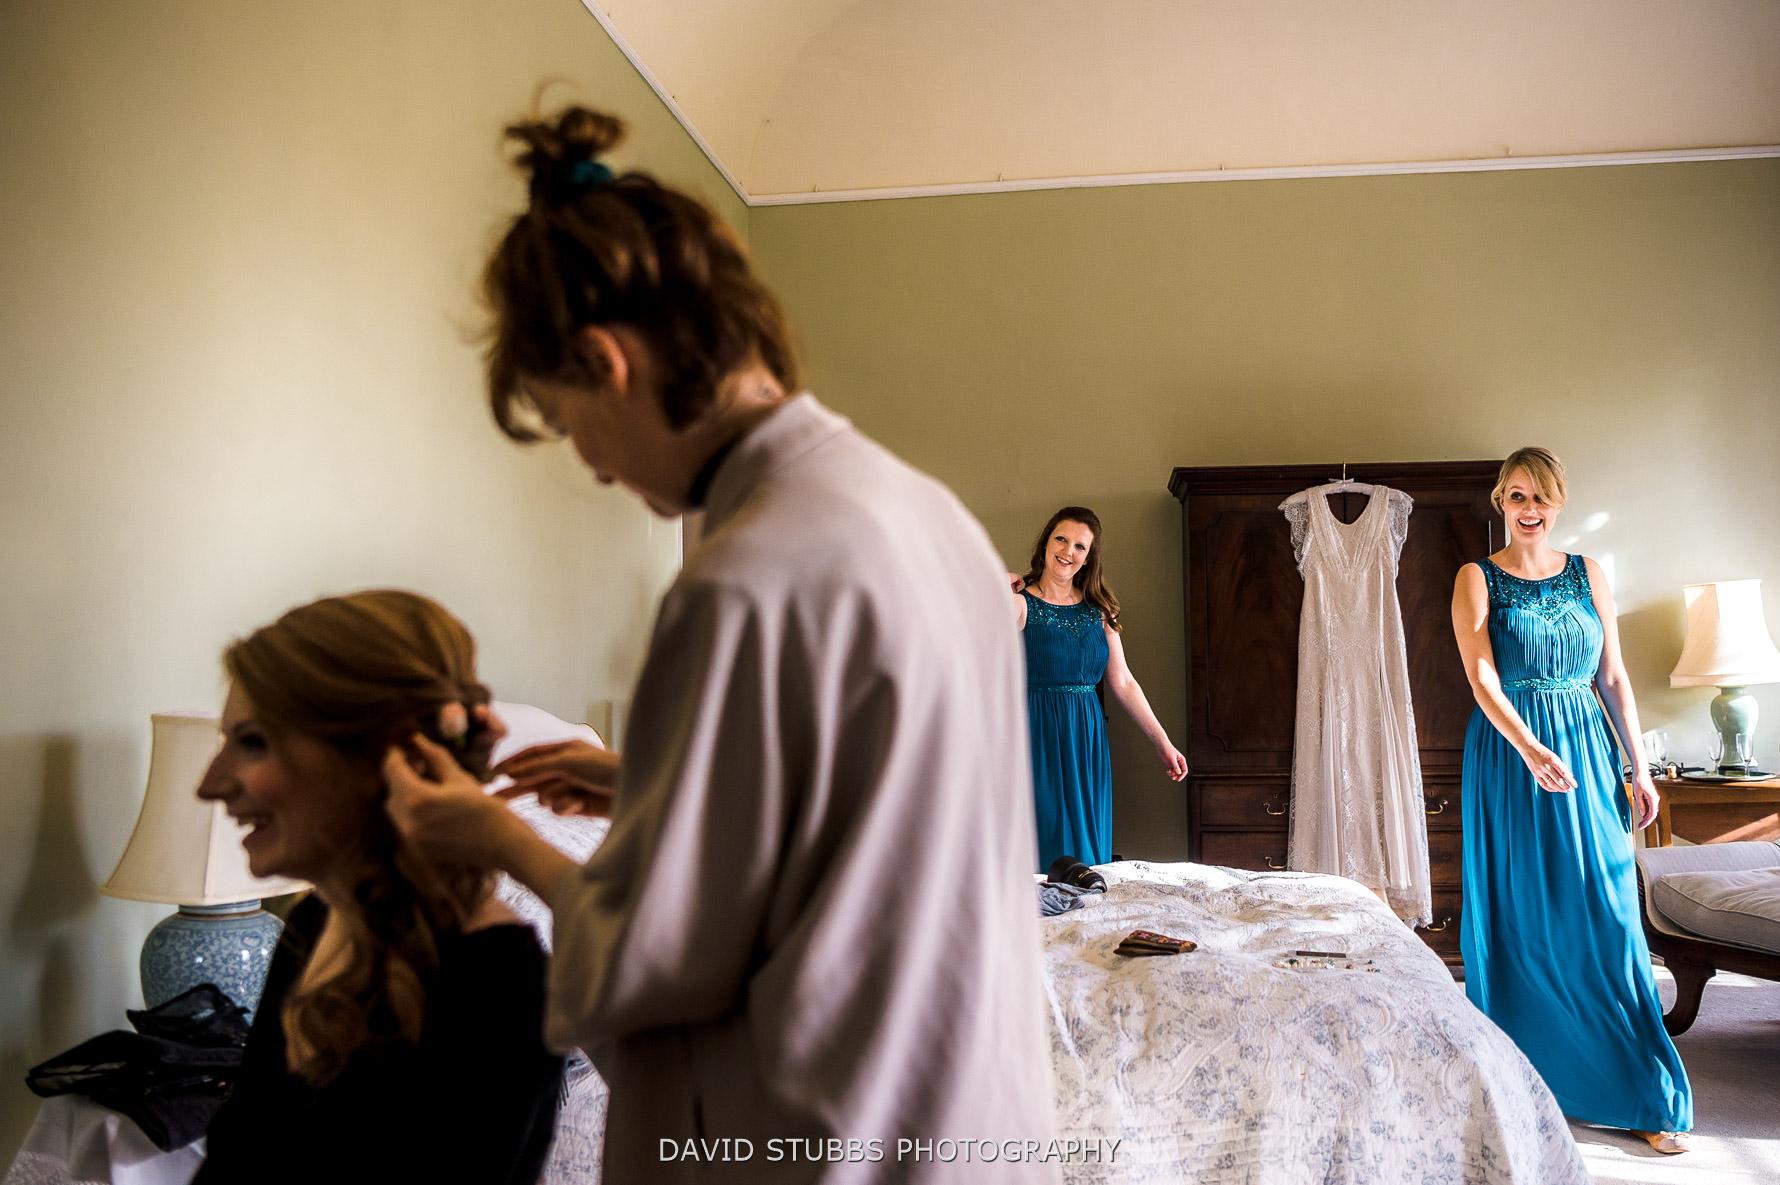 bridesmaids enter the room